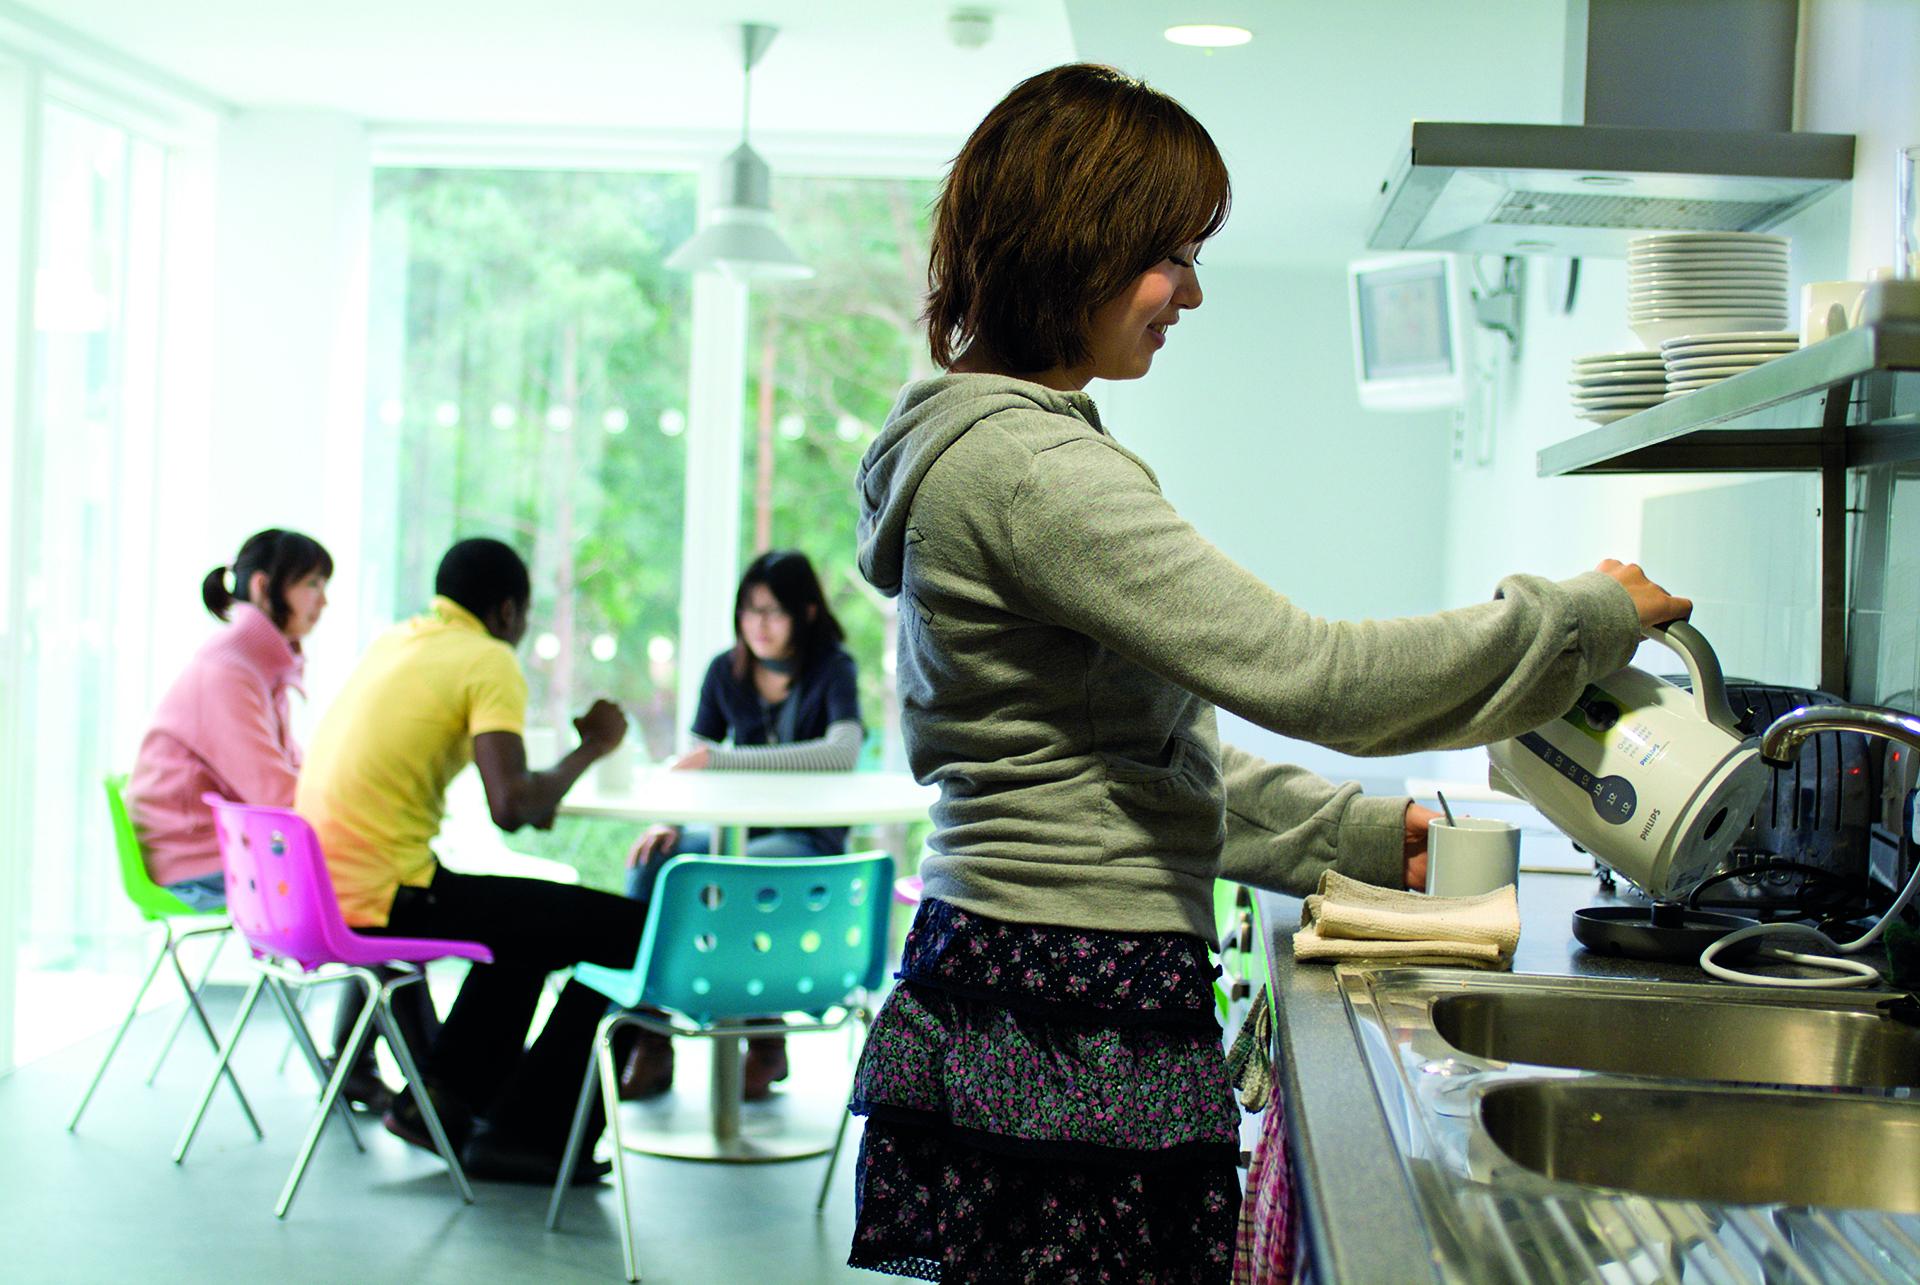 INTO UEA中心学生宿舍内的共用厨房